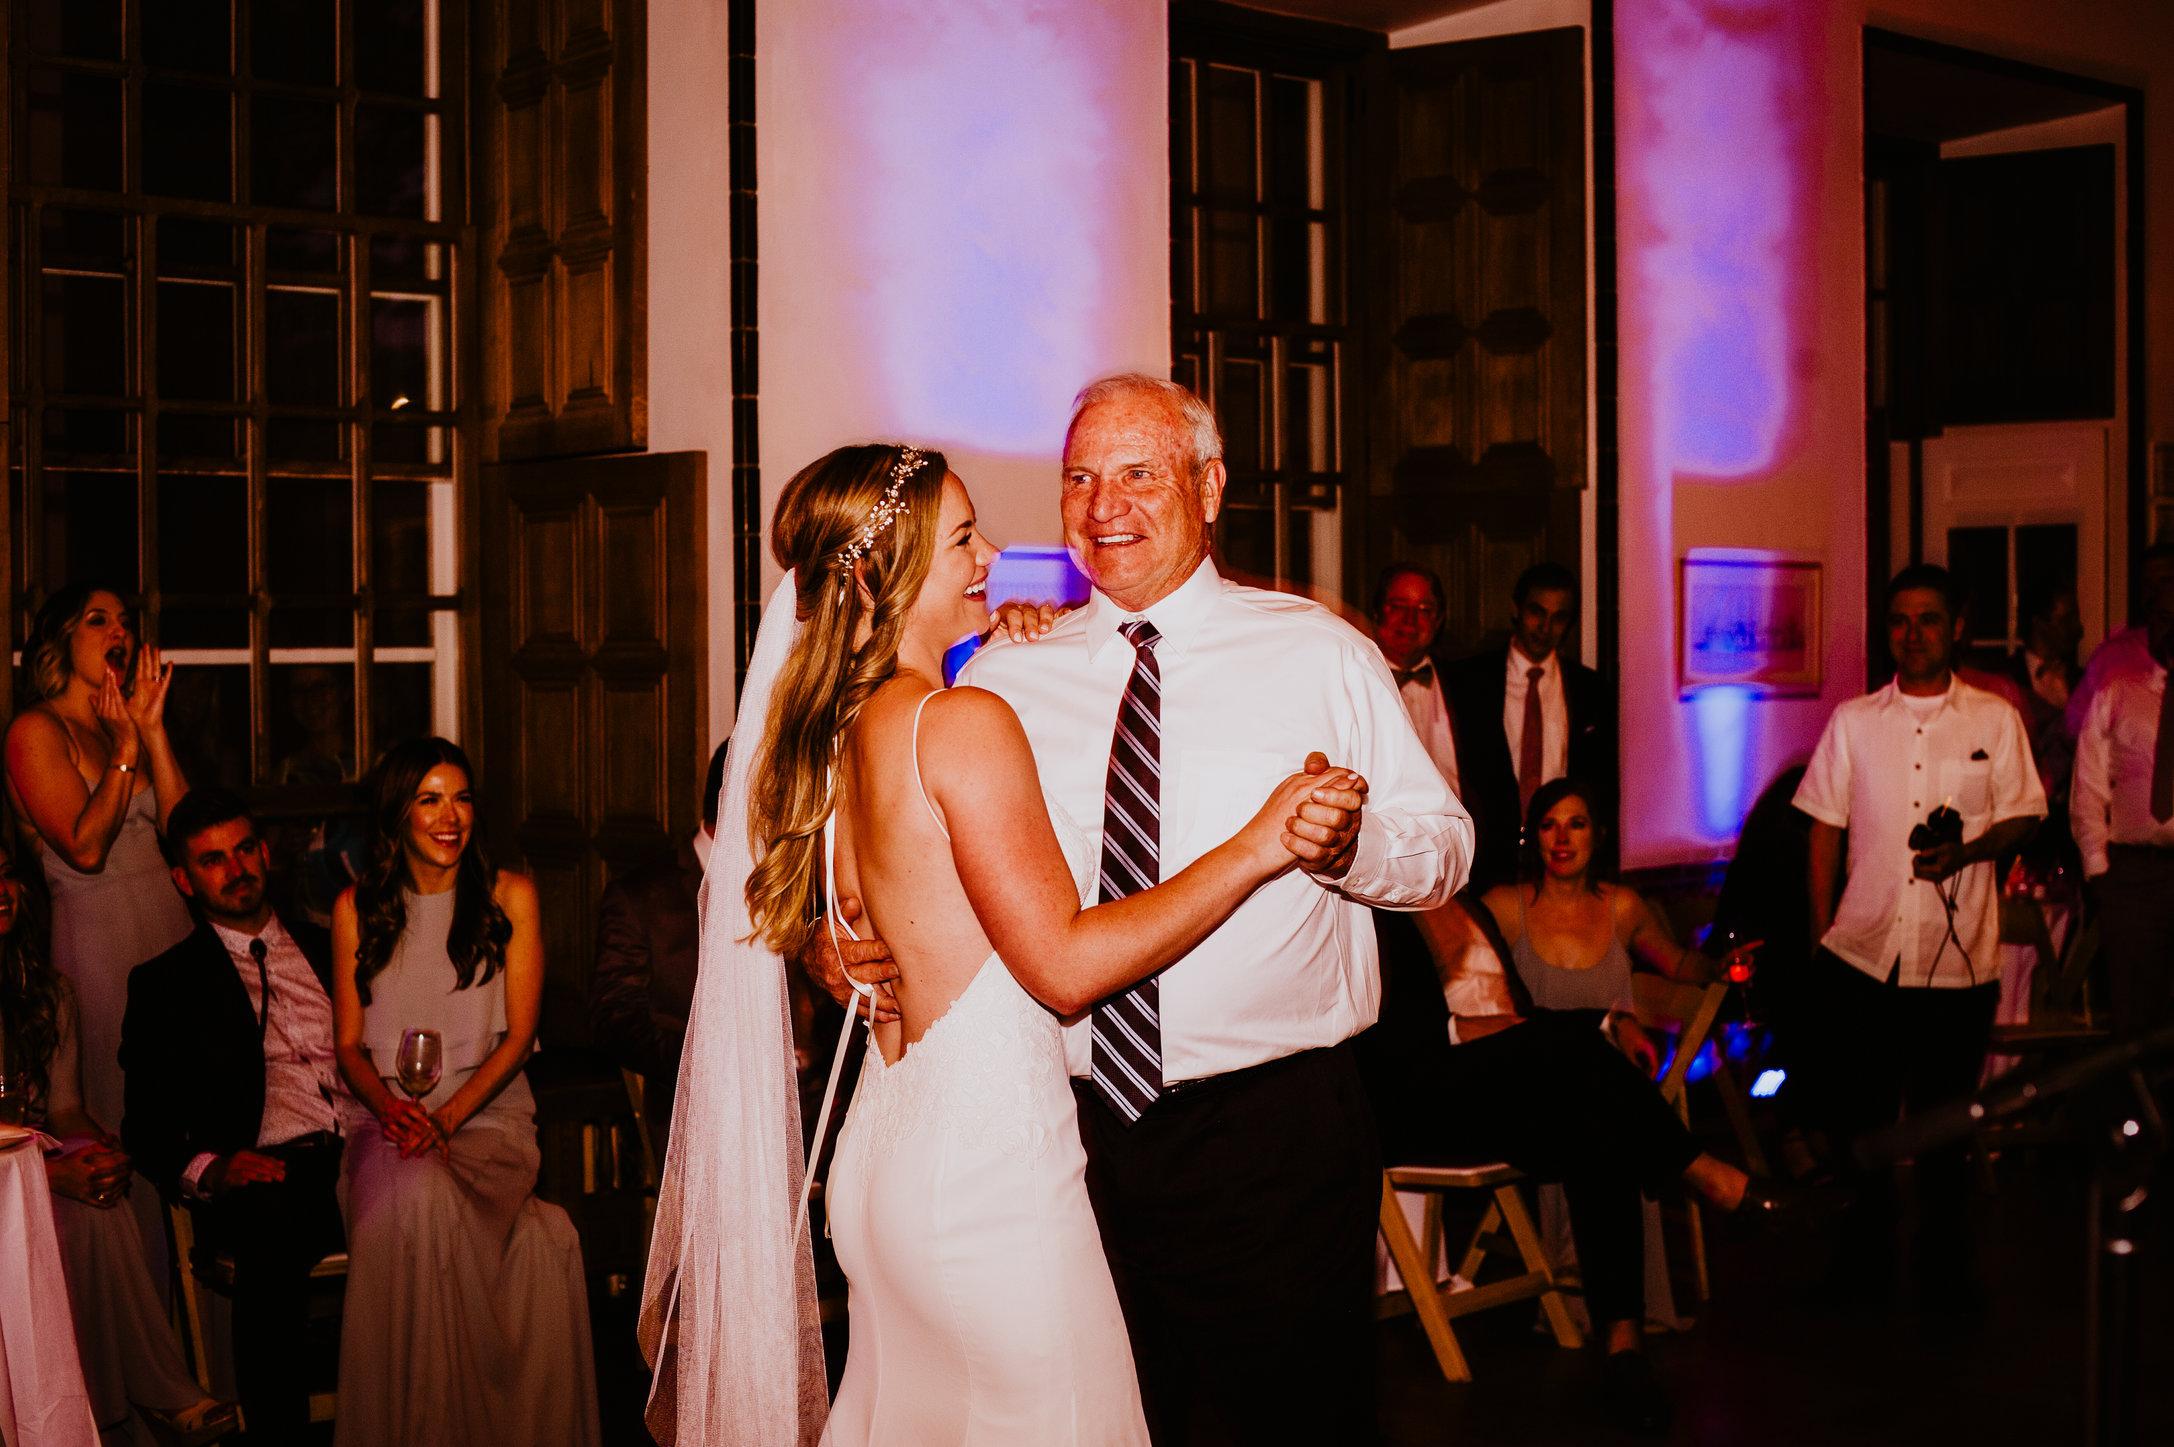 DandA-wedding-811.jpg